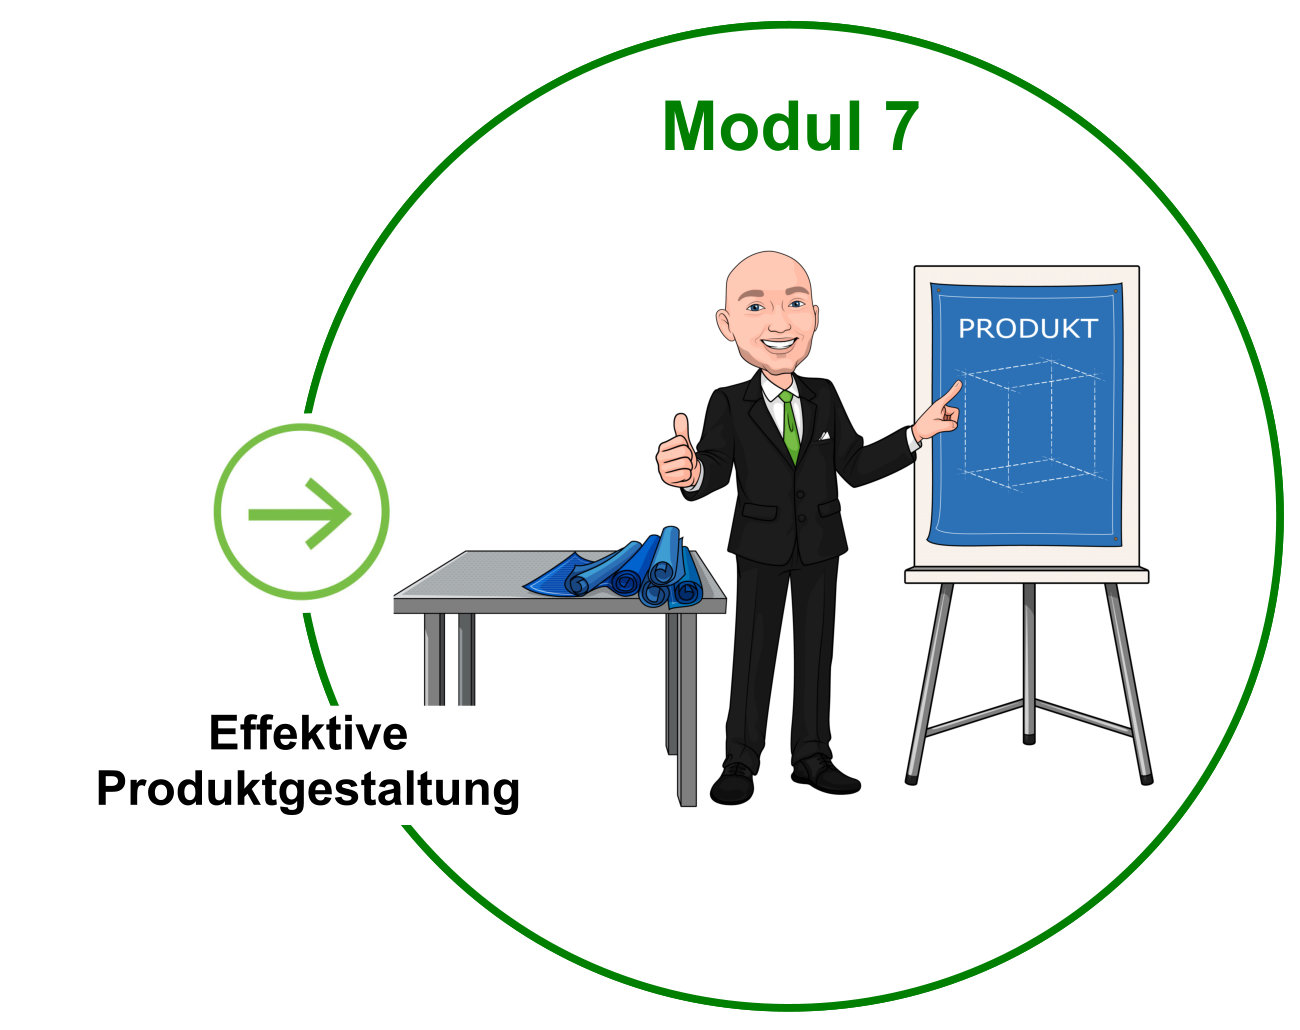 Modul 7 - Effektive Produktgestaltung